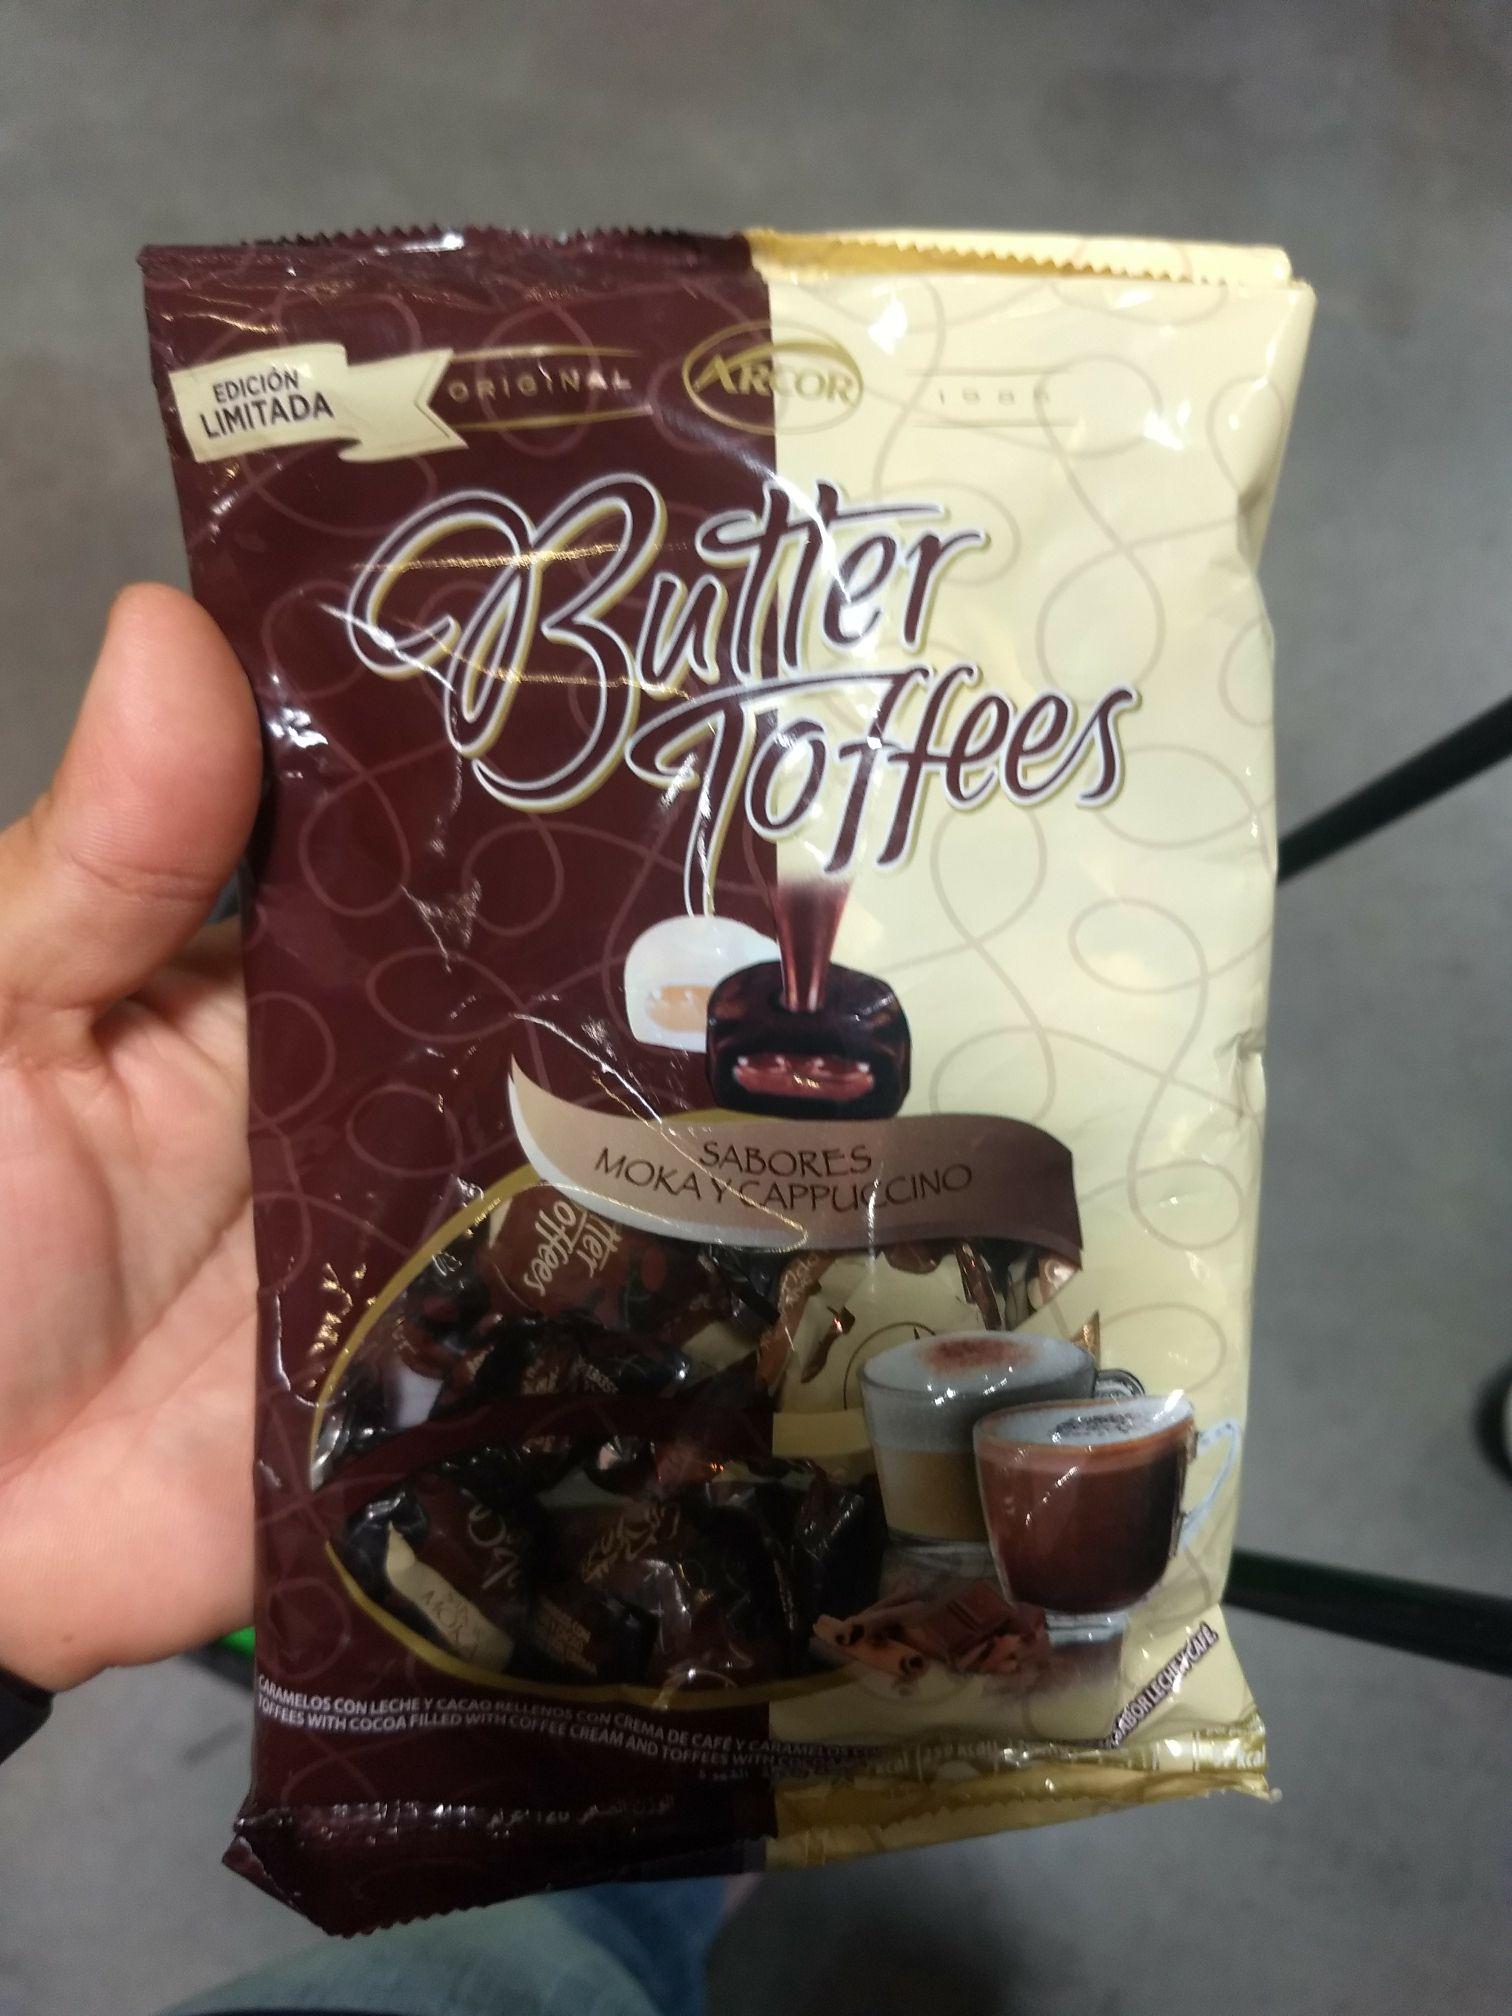 Bodega Aurrerá: Butter toffees de moka y capuchino en 7.02